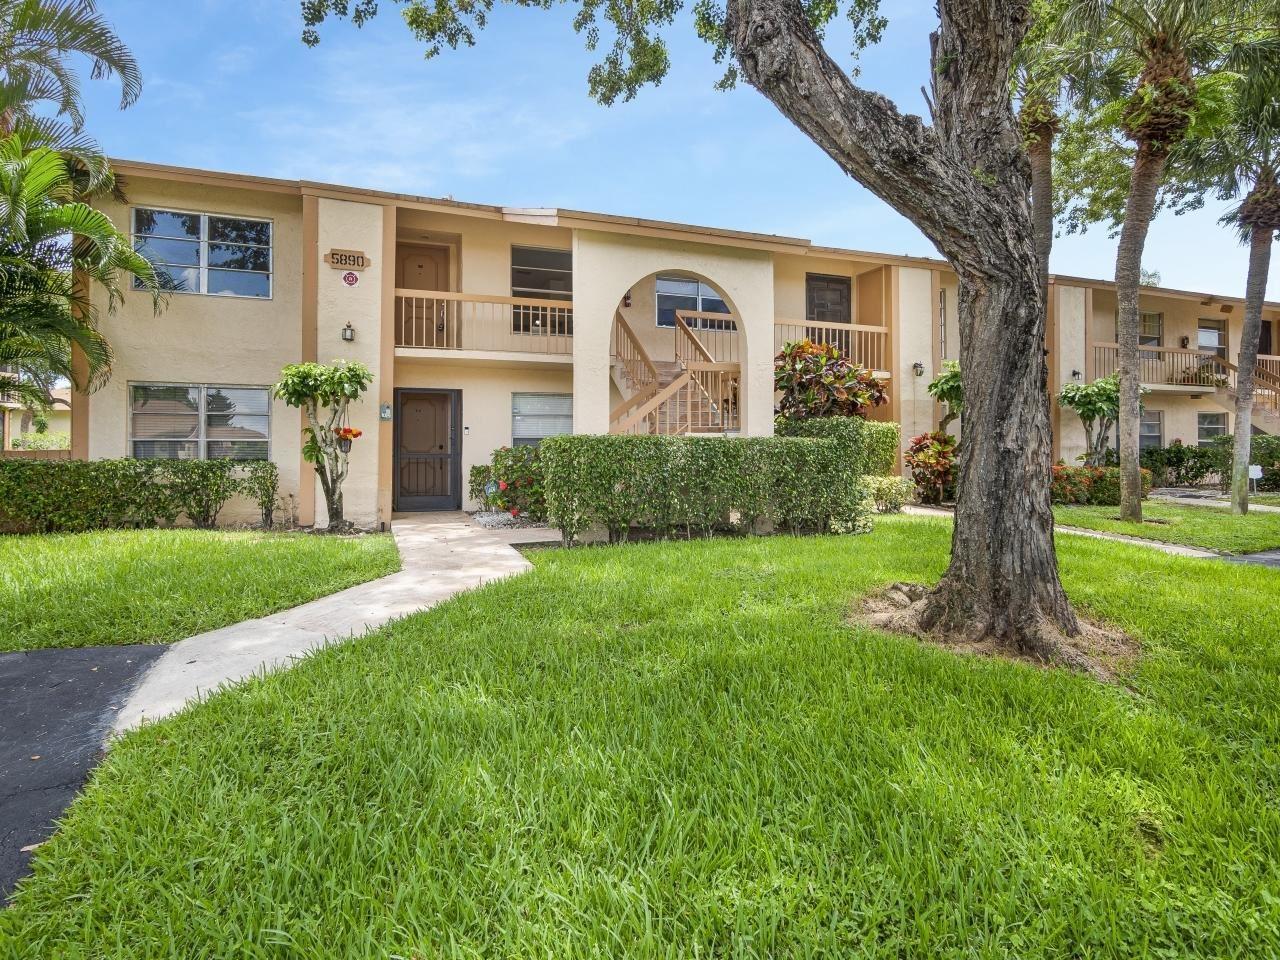 5890 Sugar Palm Court #E, Delray Beach, FL 33484 - MLS#: RX-10730703